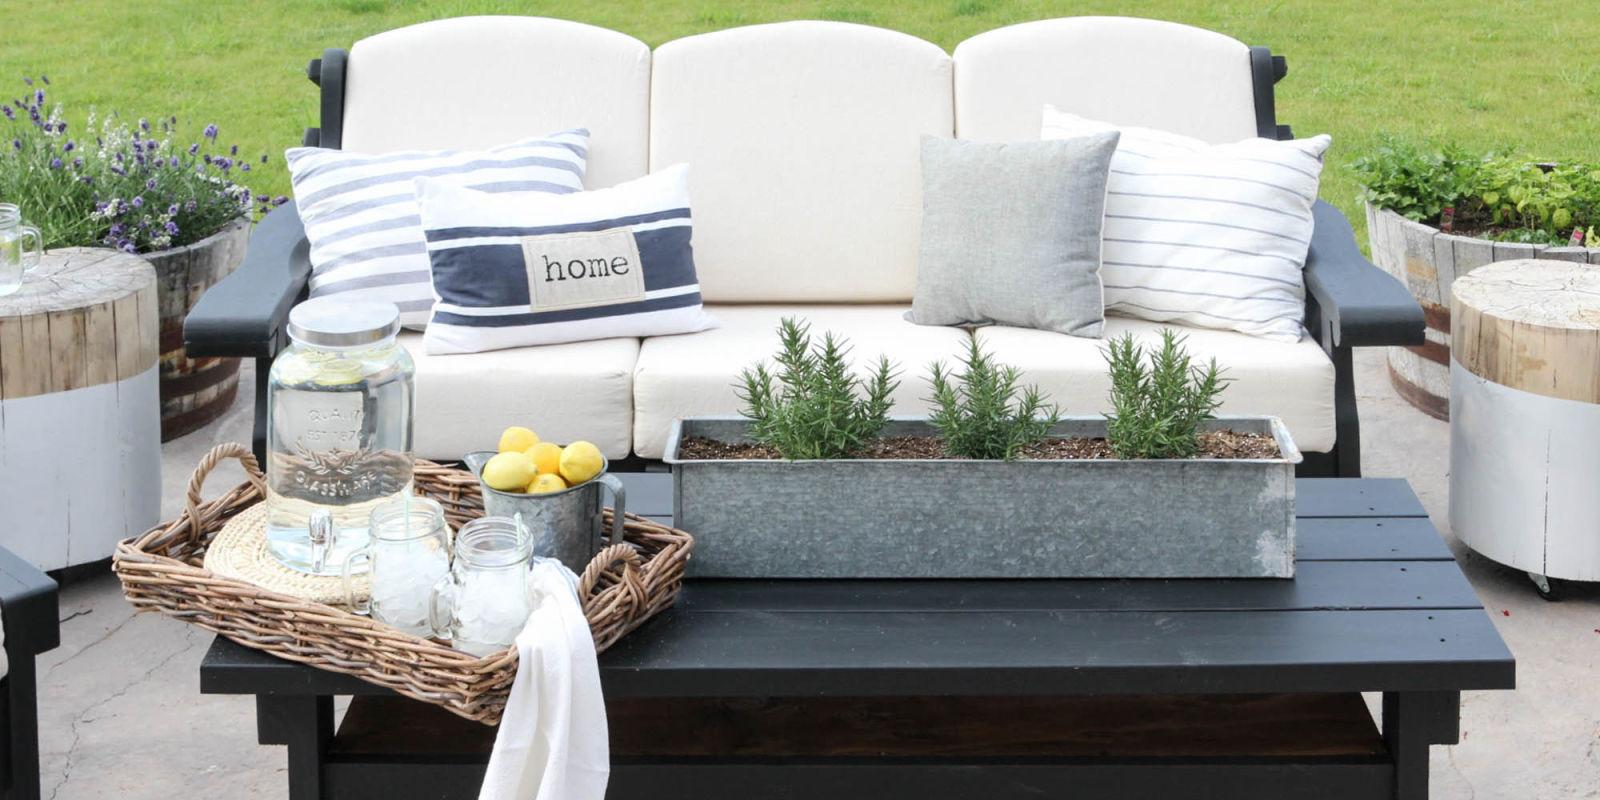 Patio Sofa Set Makeover Craigslist Furniture Makeover - Good housekeeping patio furniture